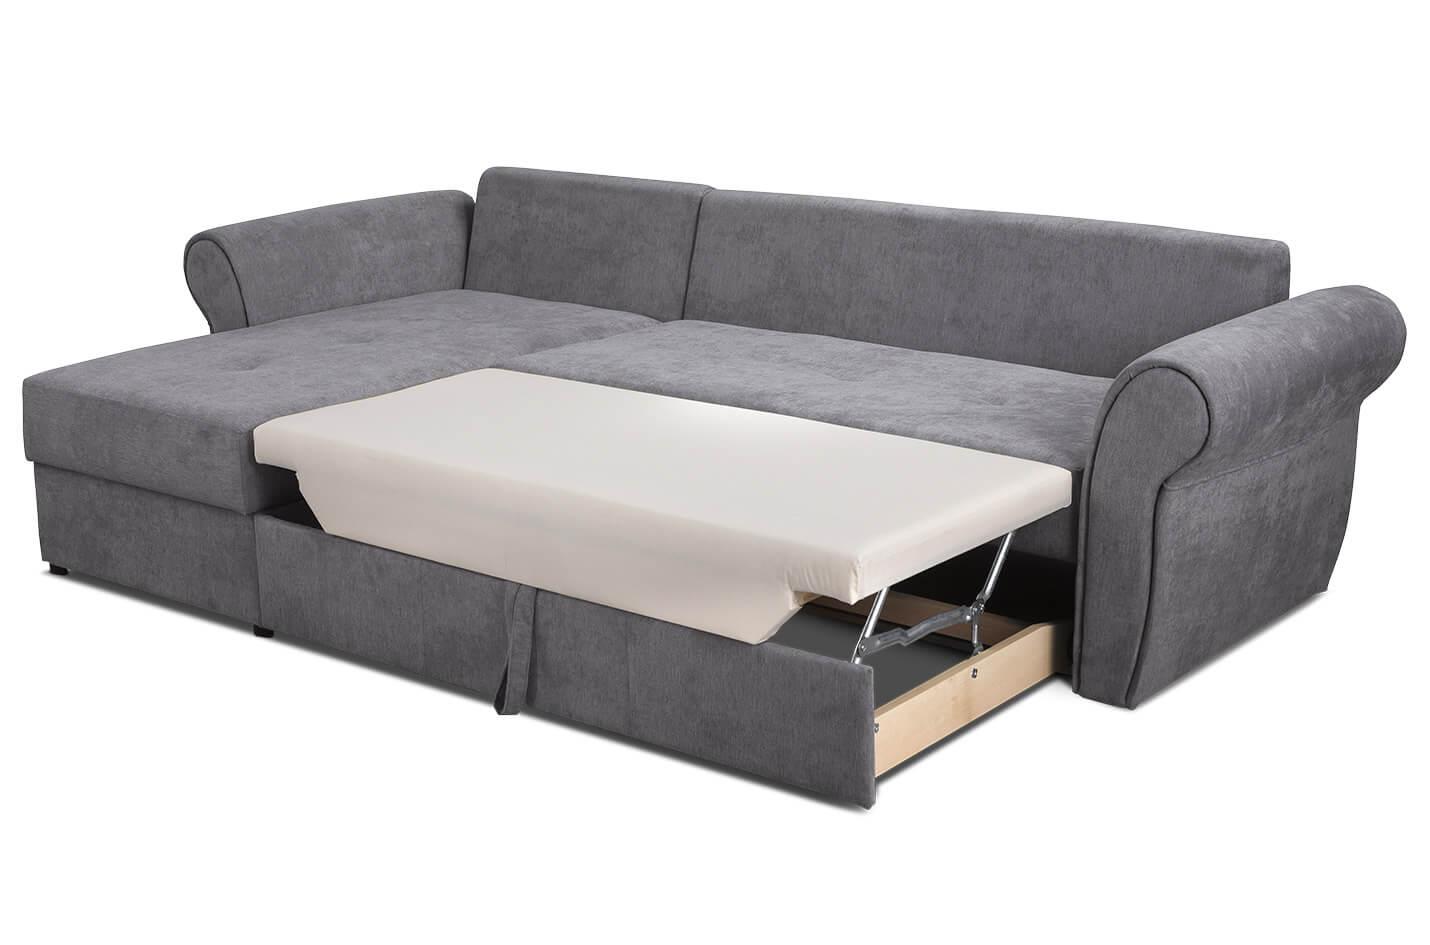 Freistellen Bildbearbeitung Möbel Sofa